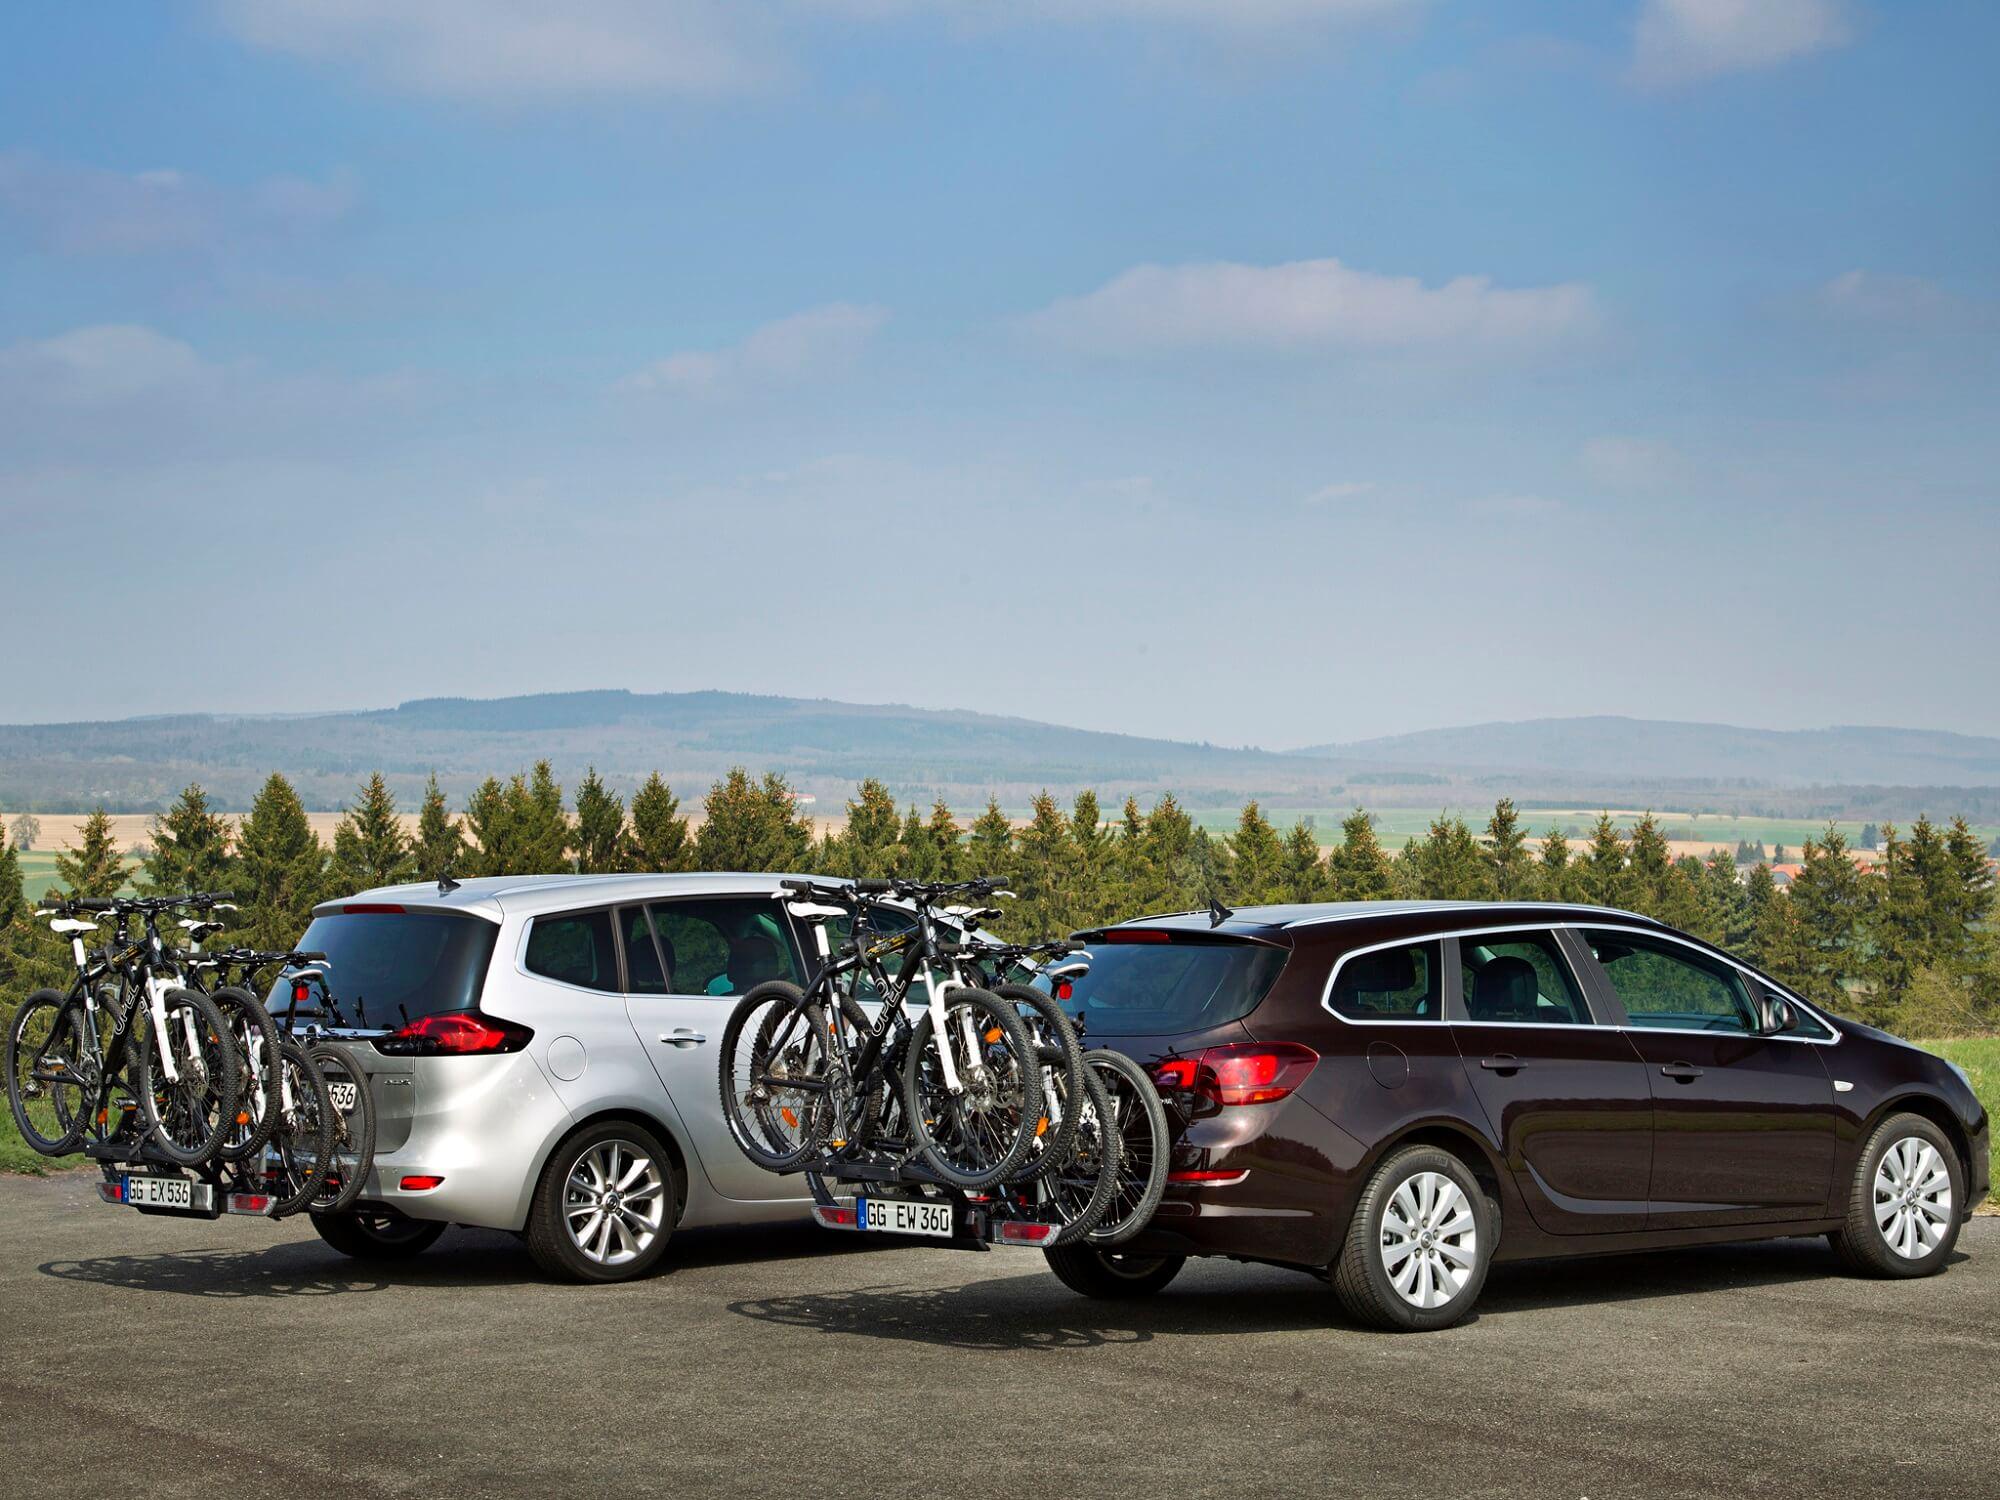 Opel Zafira e Astra transporte bicicletas